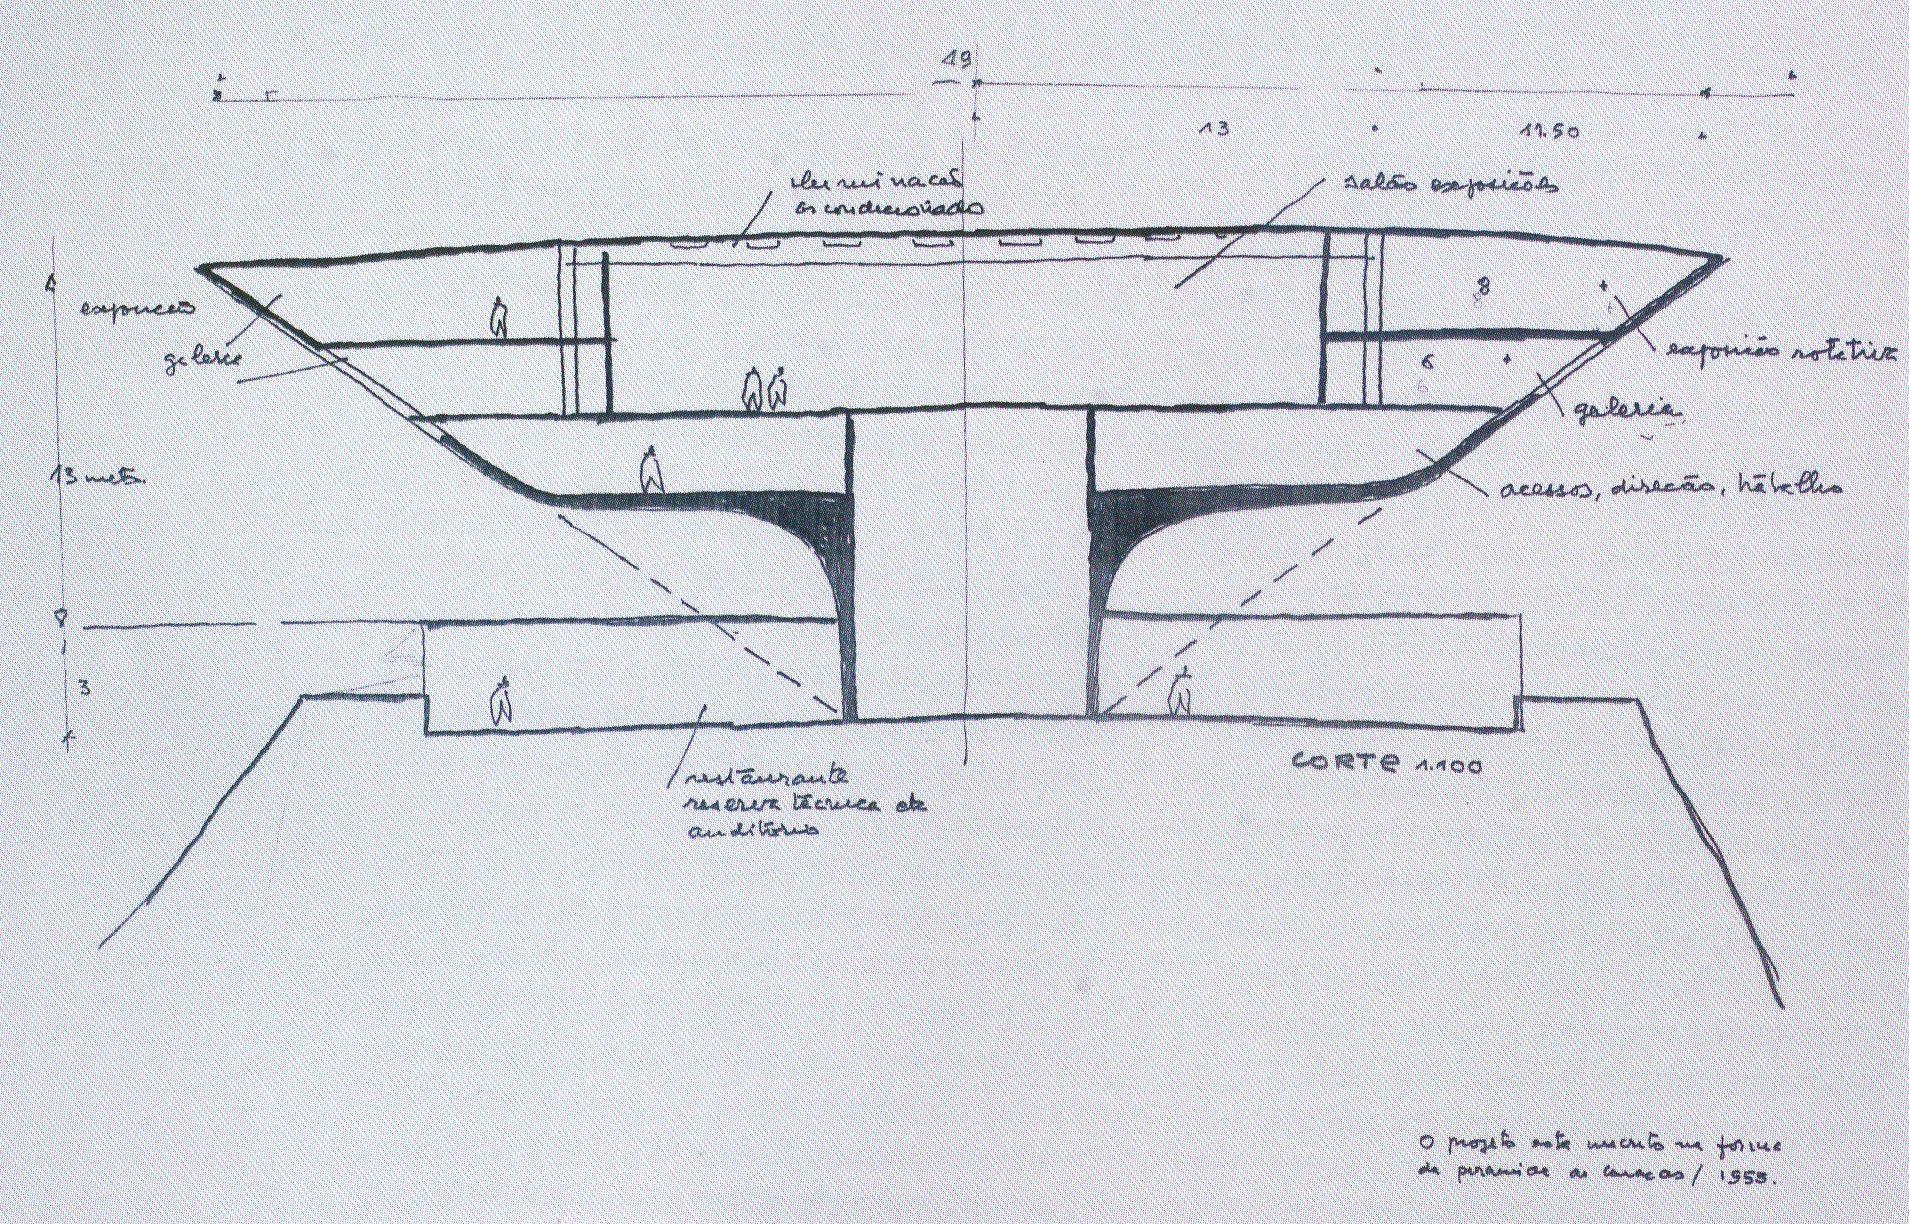 Niemeyer - Niteroi